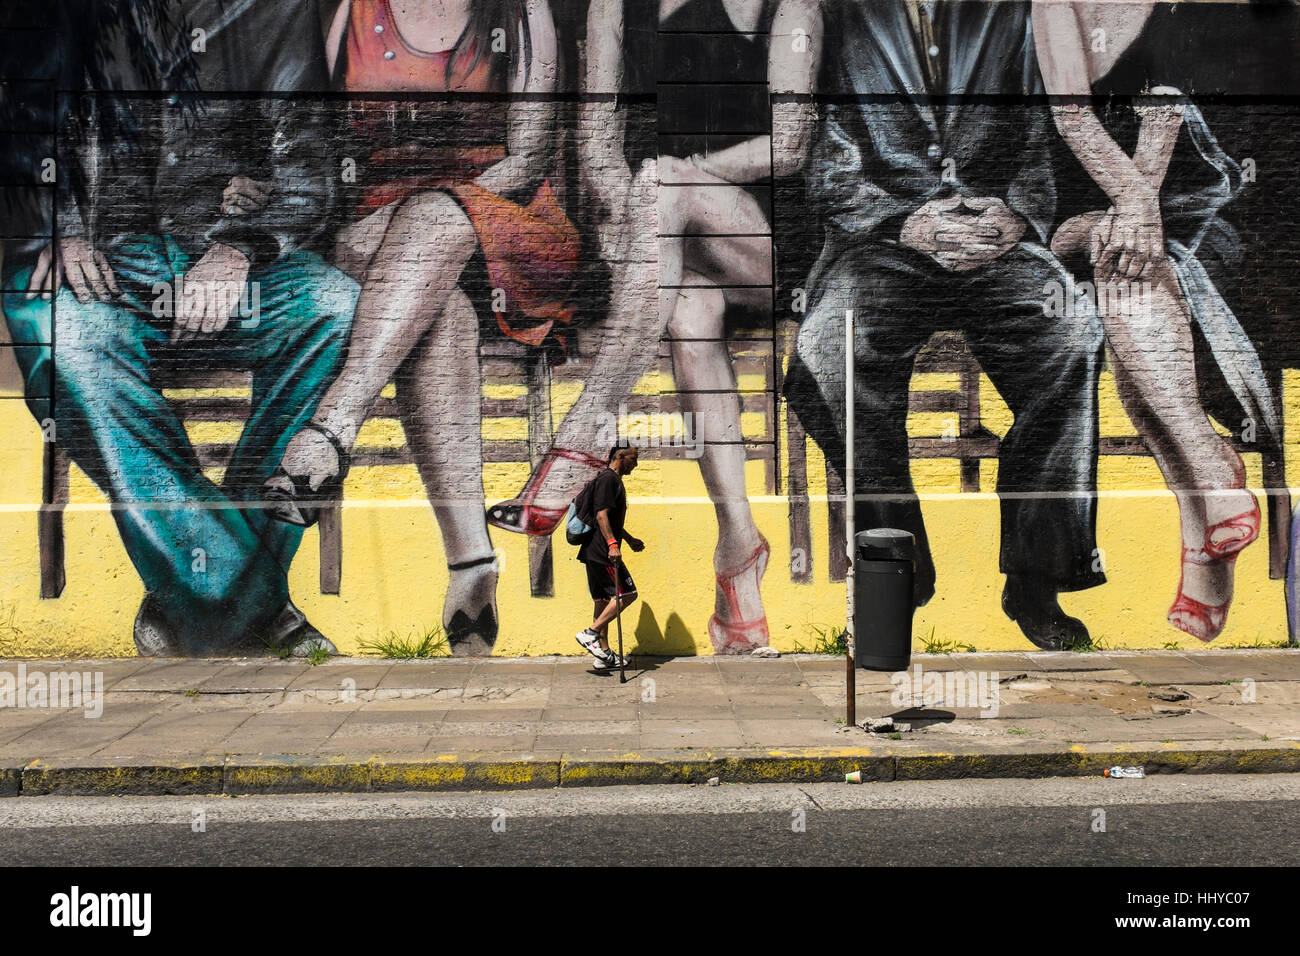 Oltrepassando una città murale raffigurante seduta coppie, città di Buenos Aires, Argentina Immagini Stock